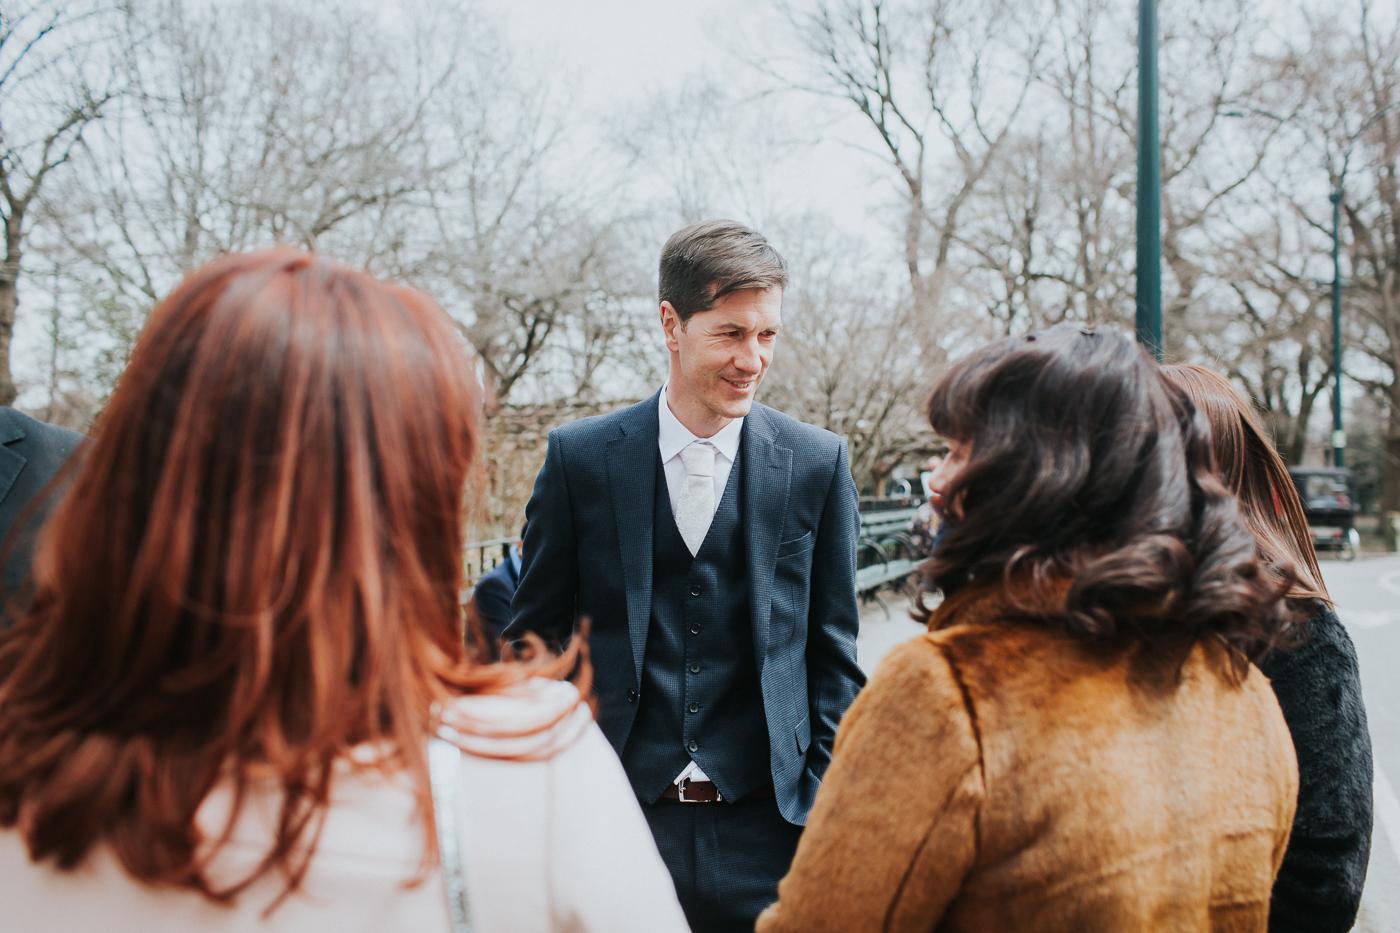 Ladies-Pavilion-Central-Park-NYC-Documentary-Elopement-Wedding-Photographer-4.jpg